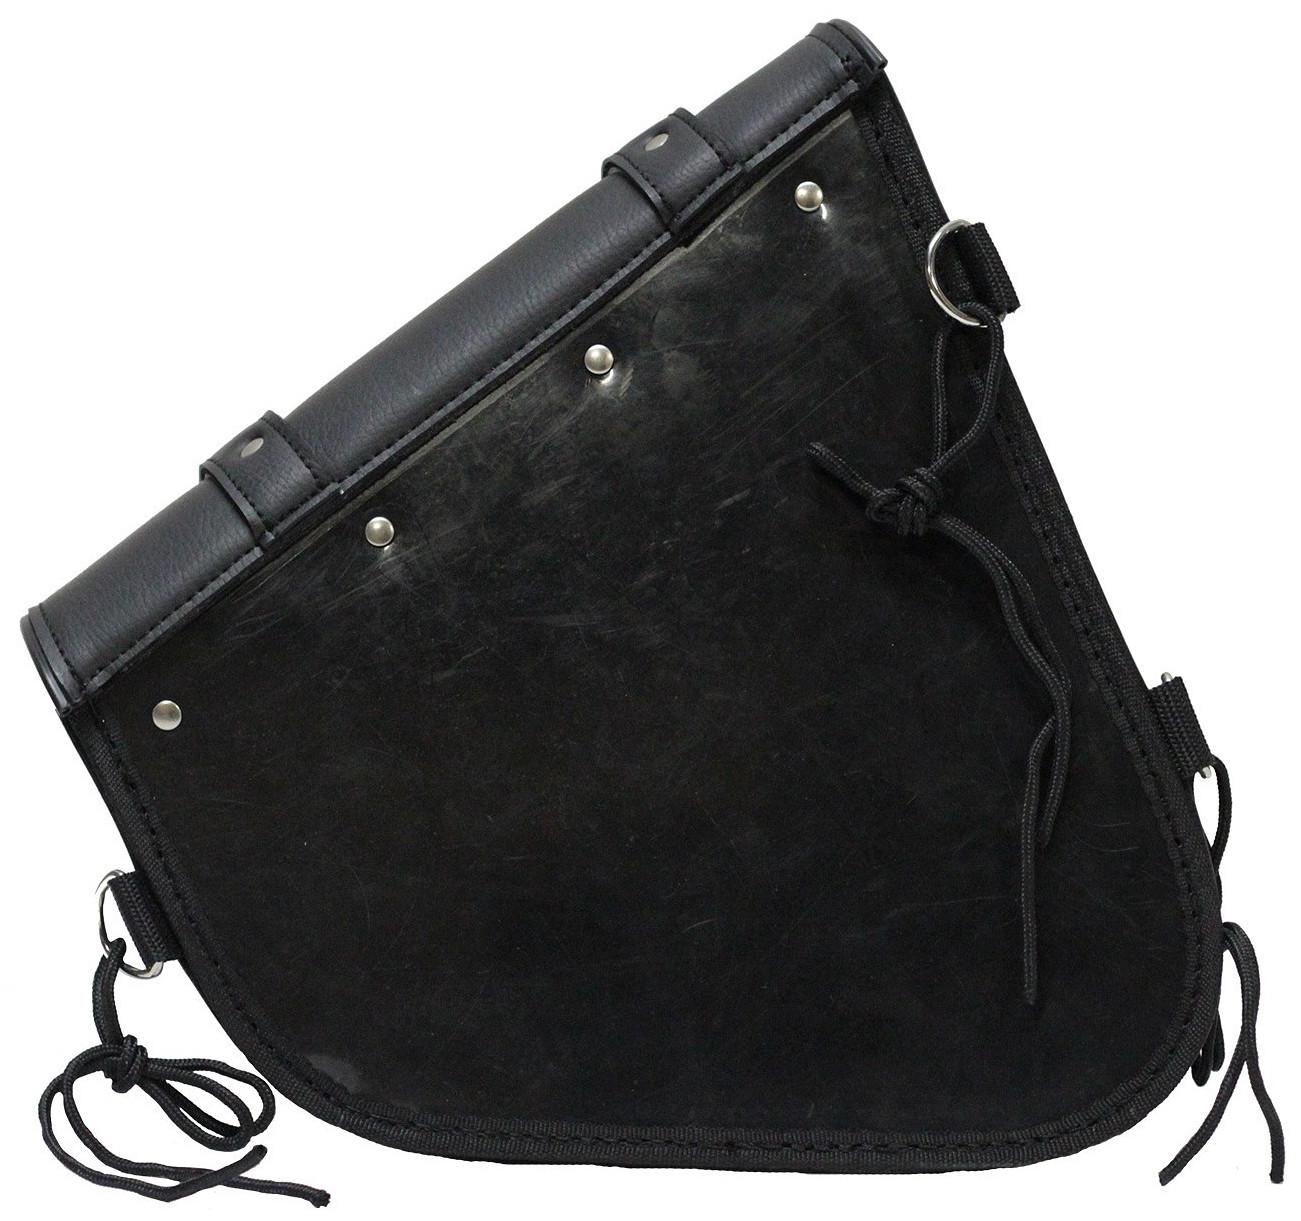 Left side swing arm bag